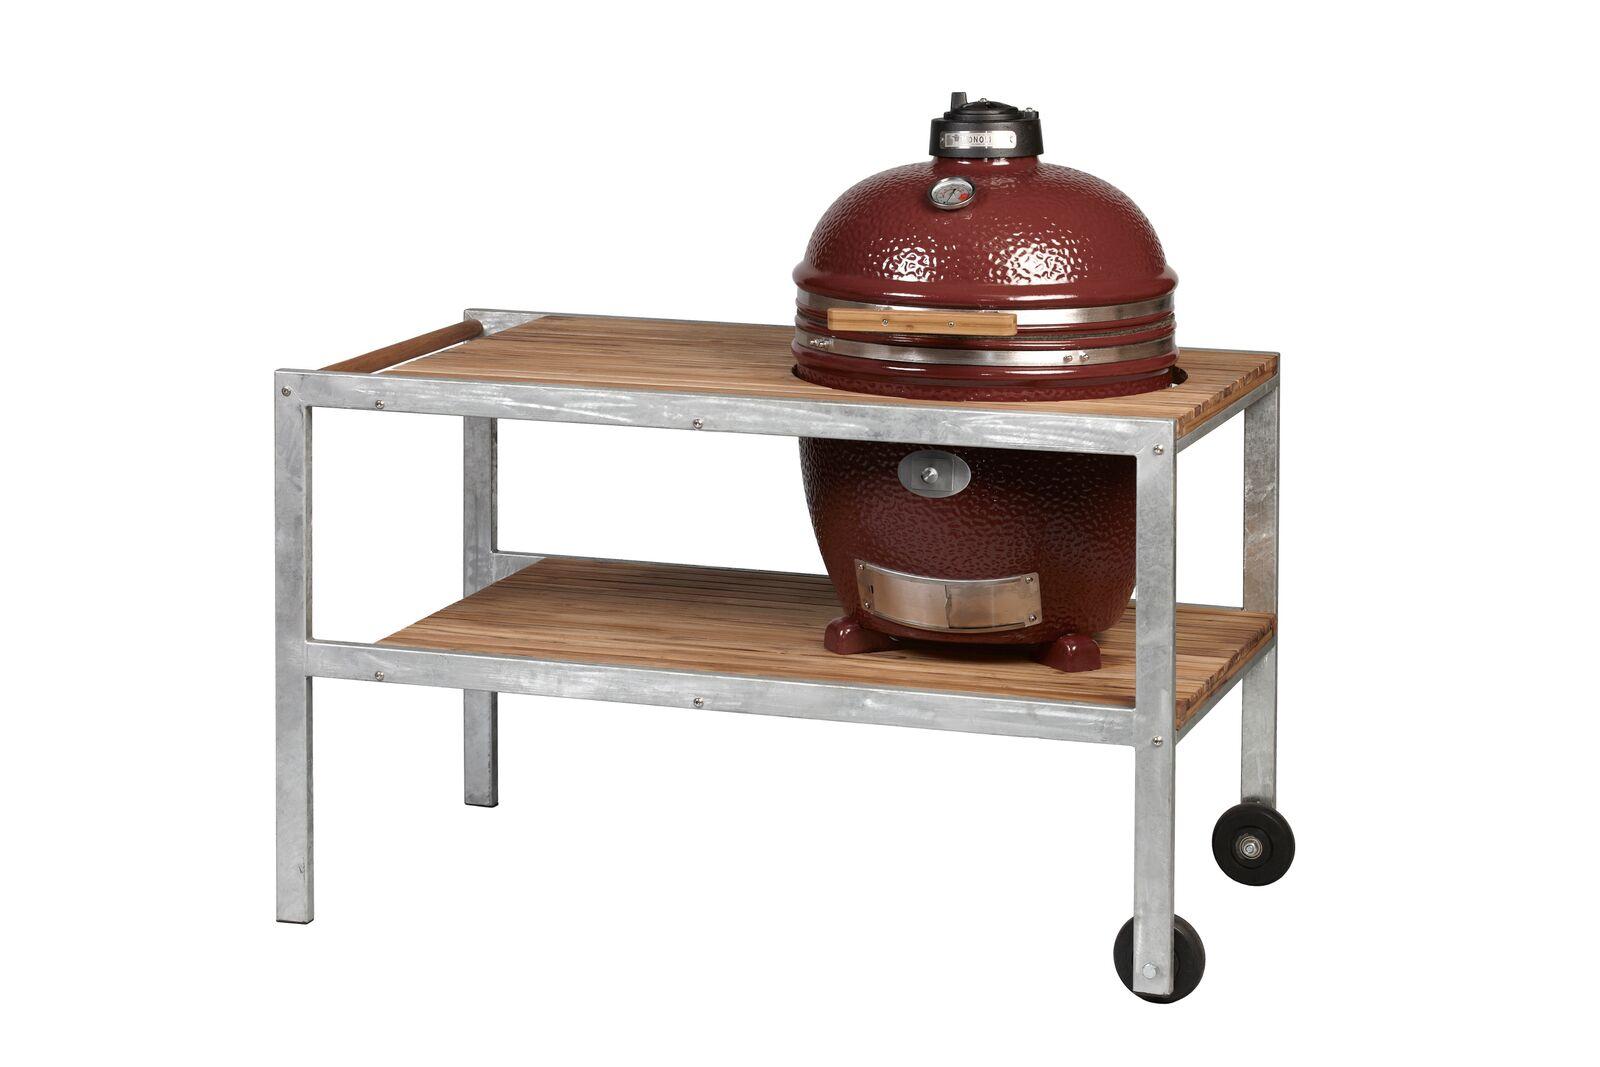 Monolith Classic with galvanised steel framed teakwood table